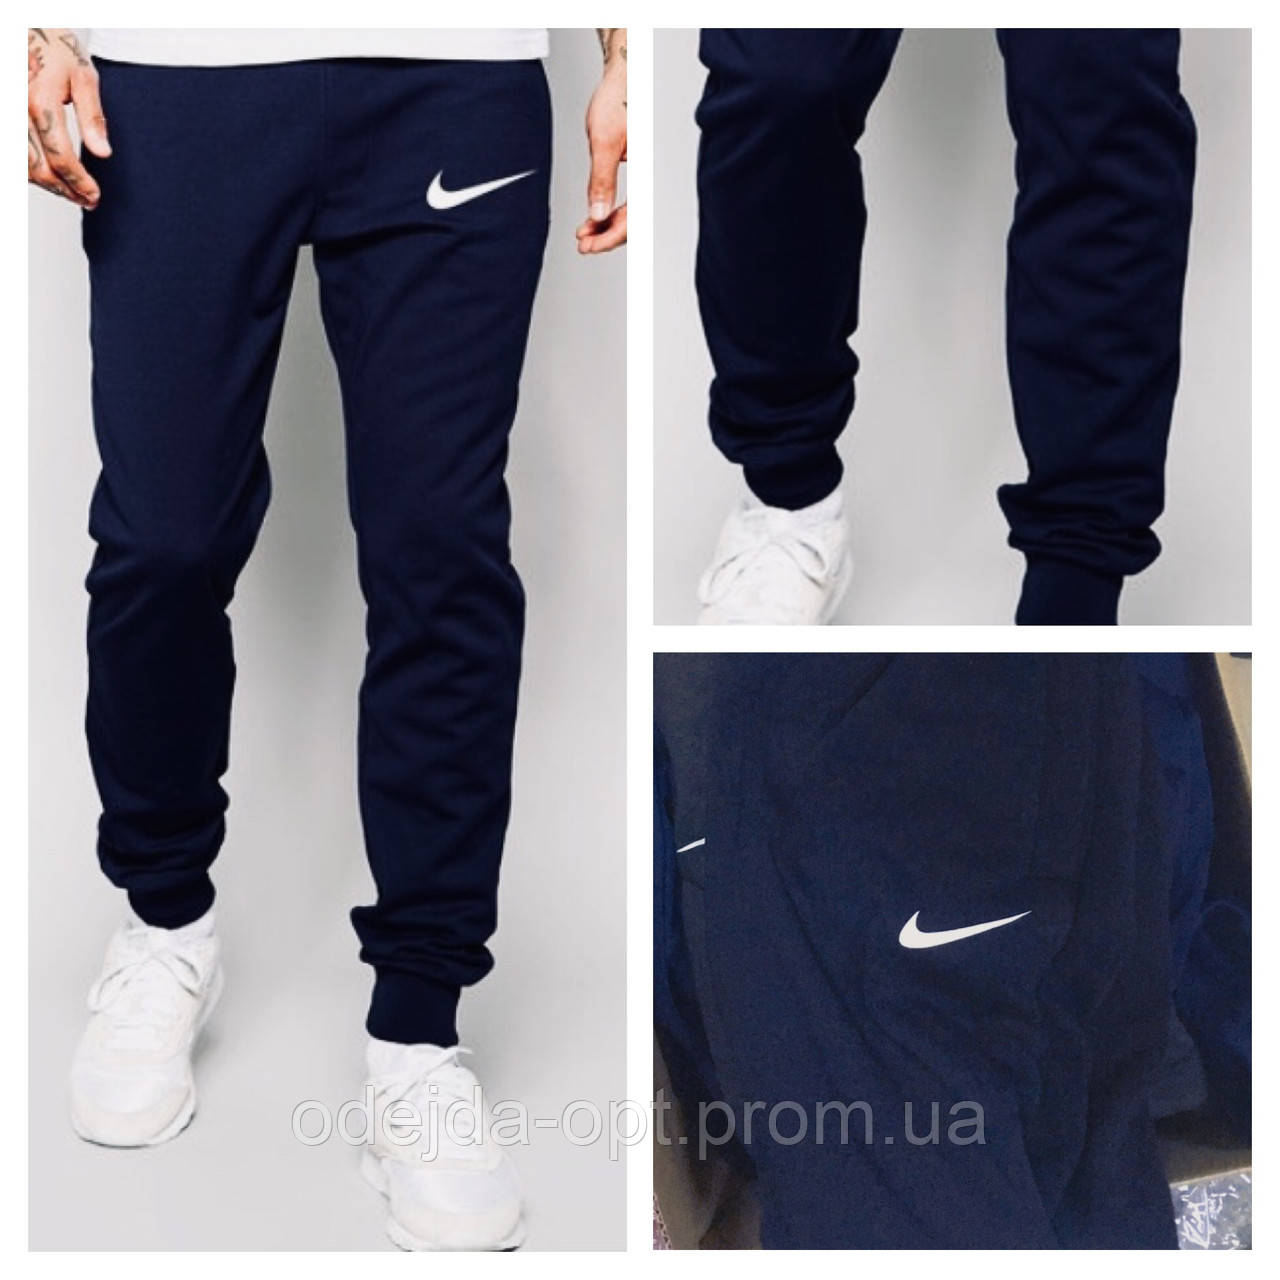 be0bf0023 Спорт штаны Nike новая ткань трикотаж флис: продажа, цена в Одесской ...